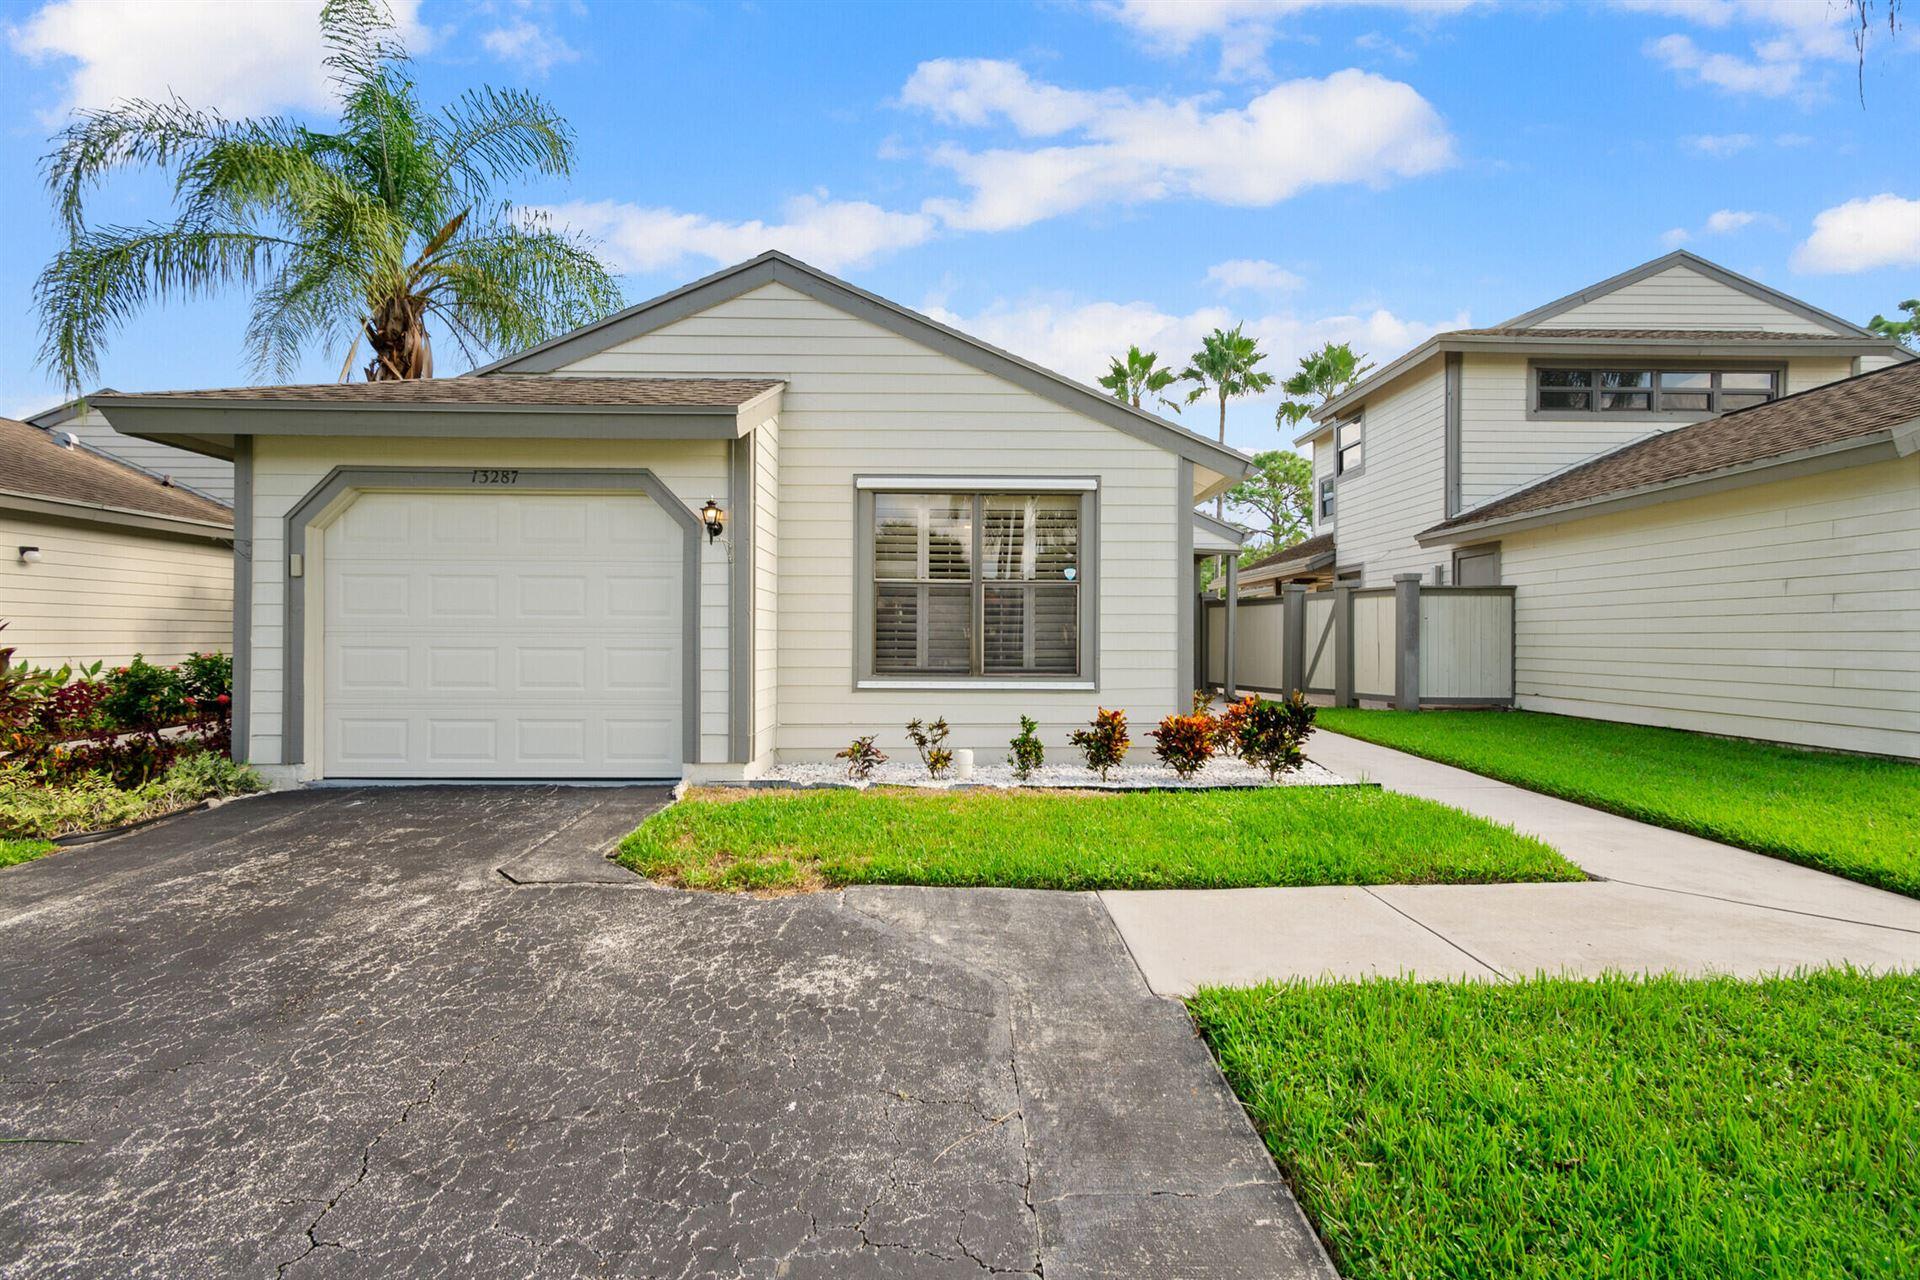 13287 Bedford Mews Court, Wellington, FL 33414 - MLS#: RX-10746253